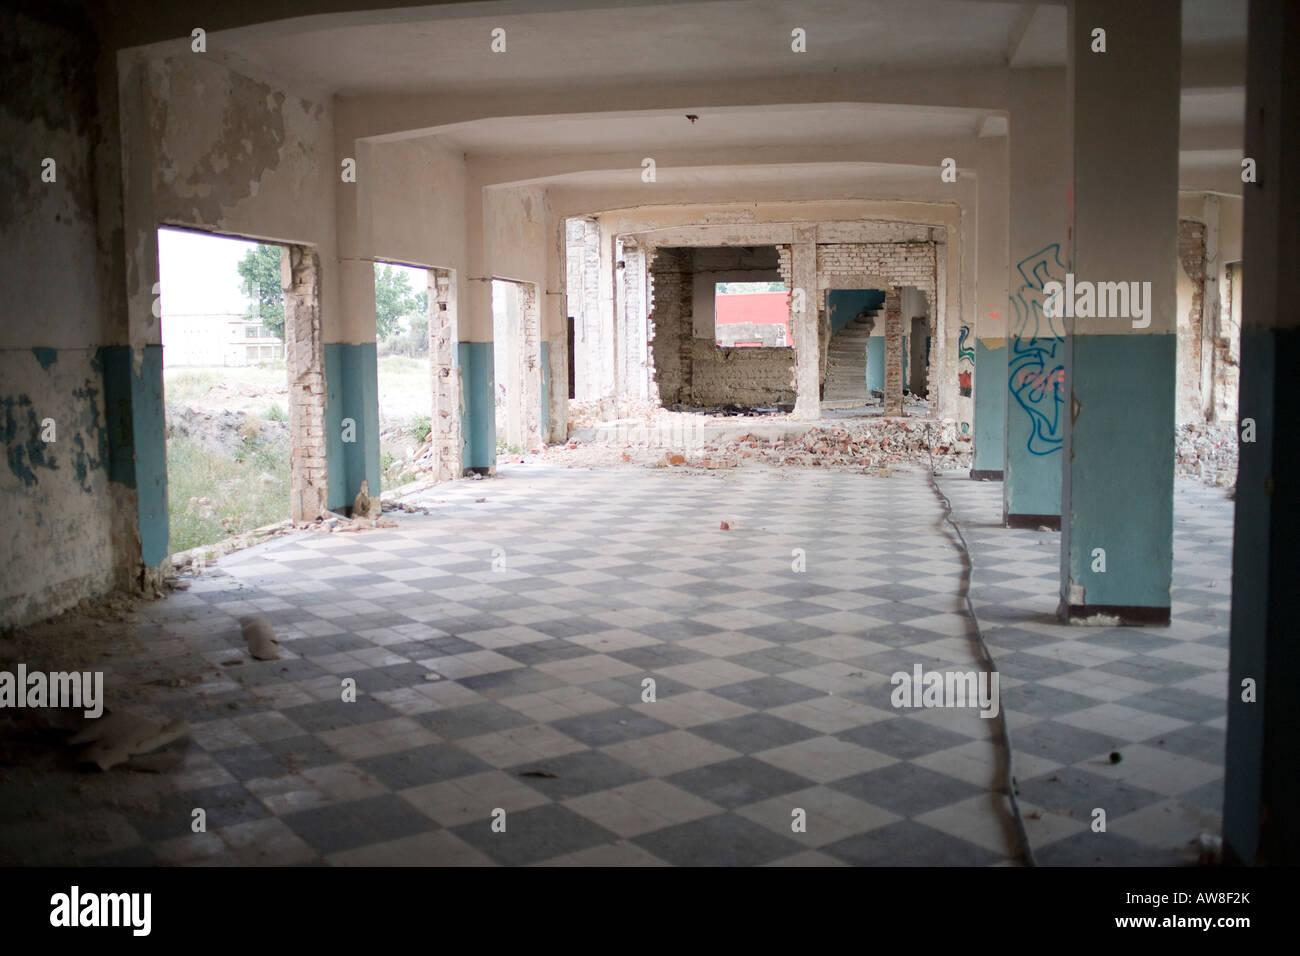 interior of a building in disrepair - Stock Image